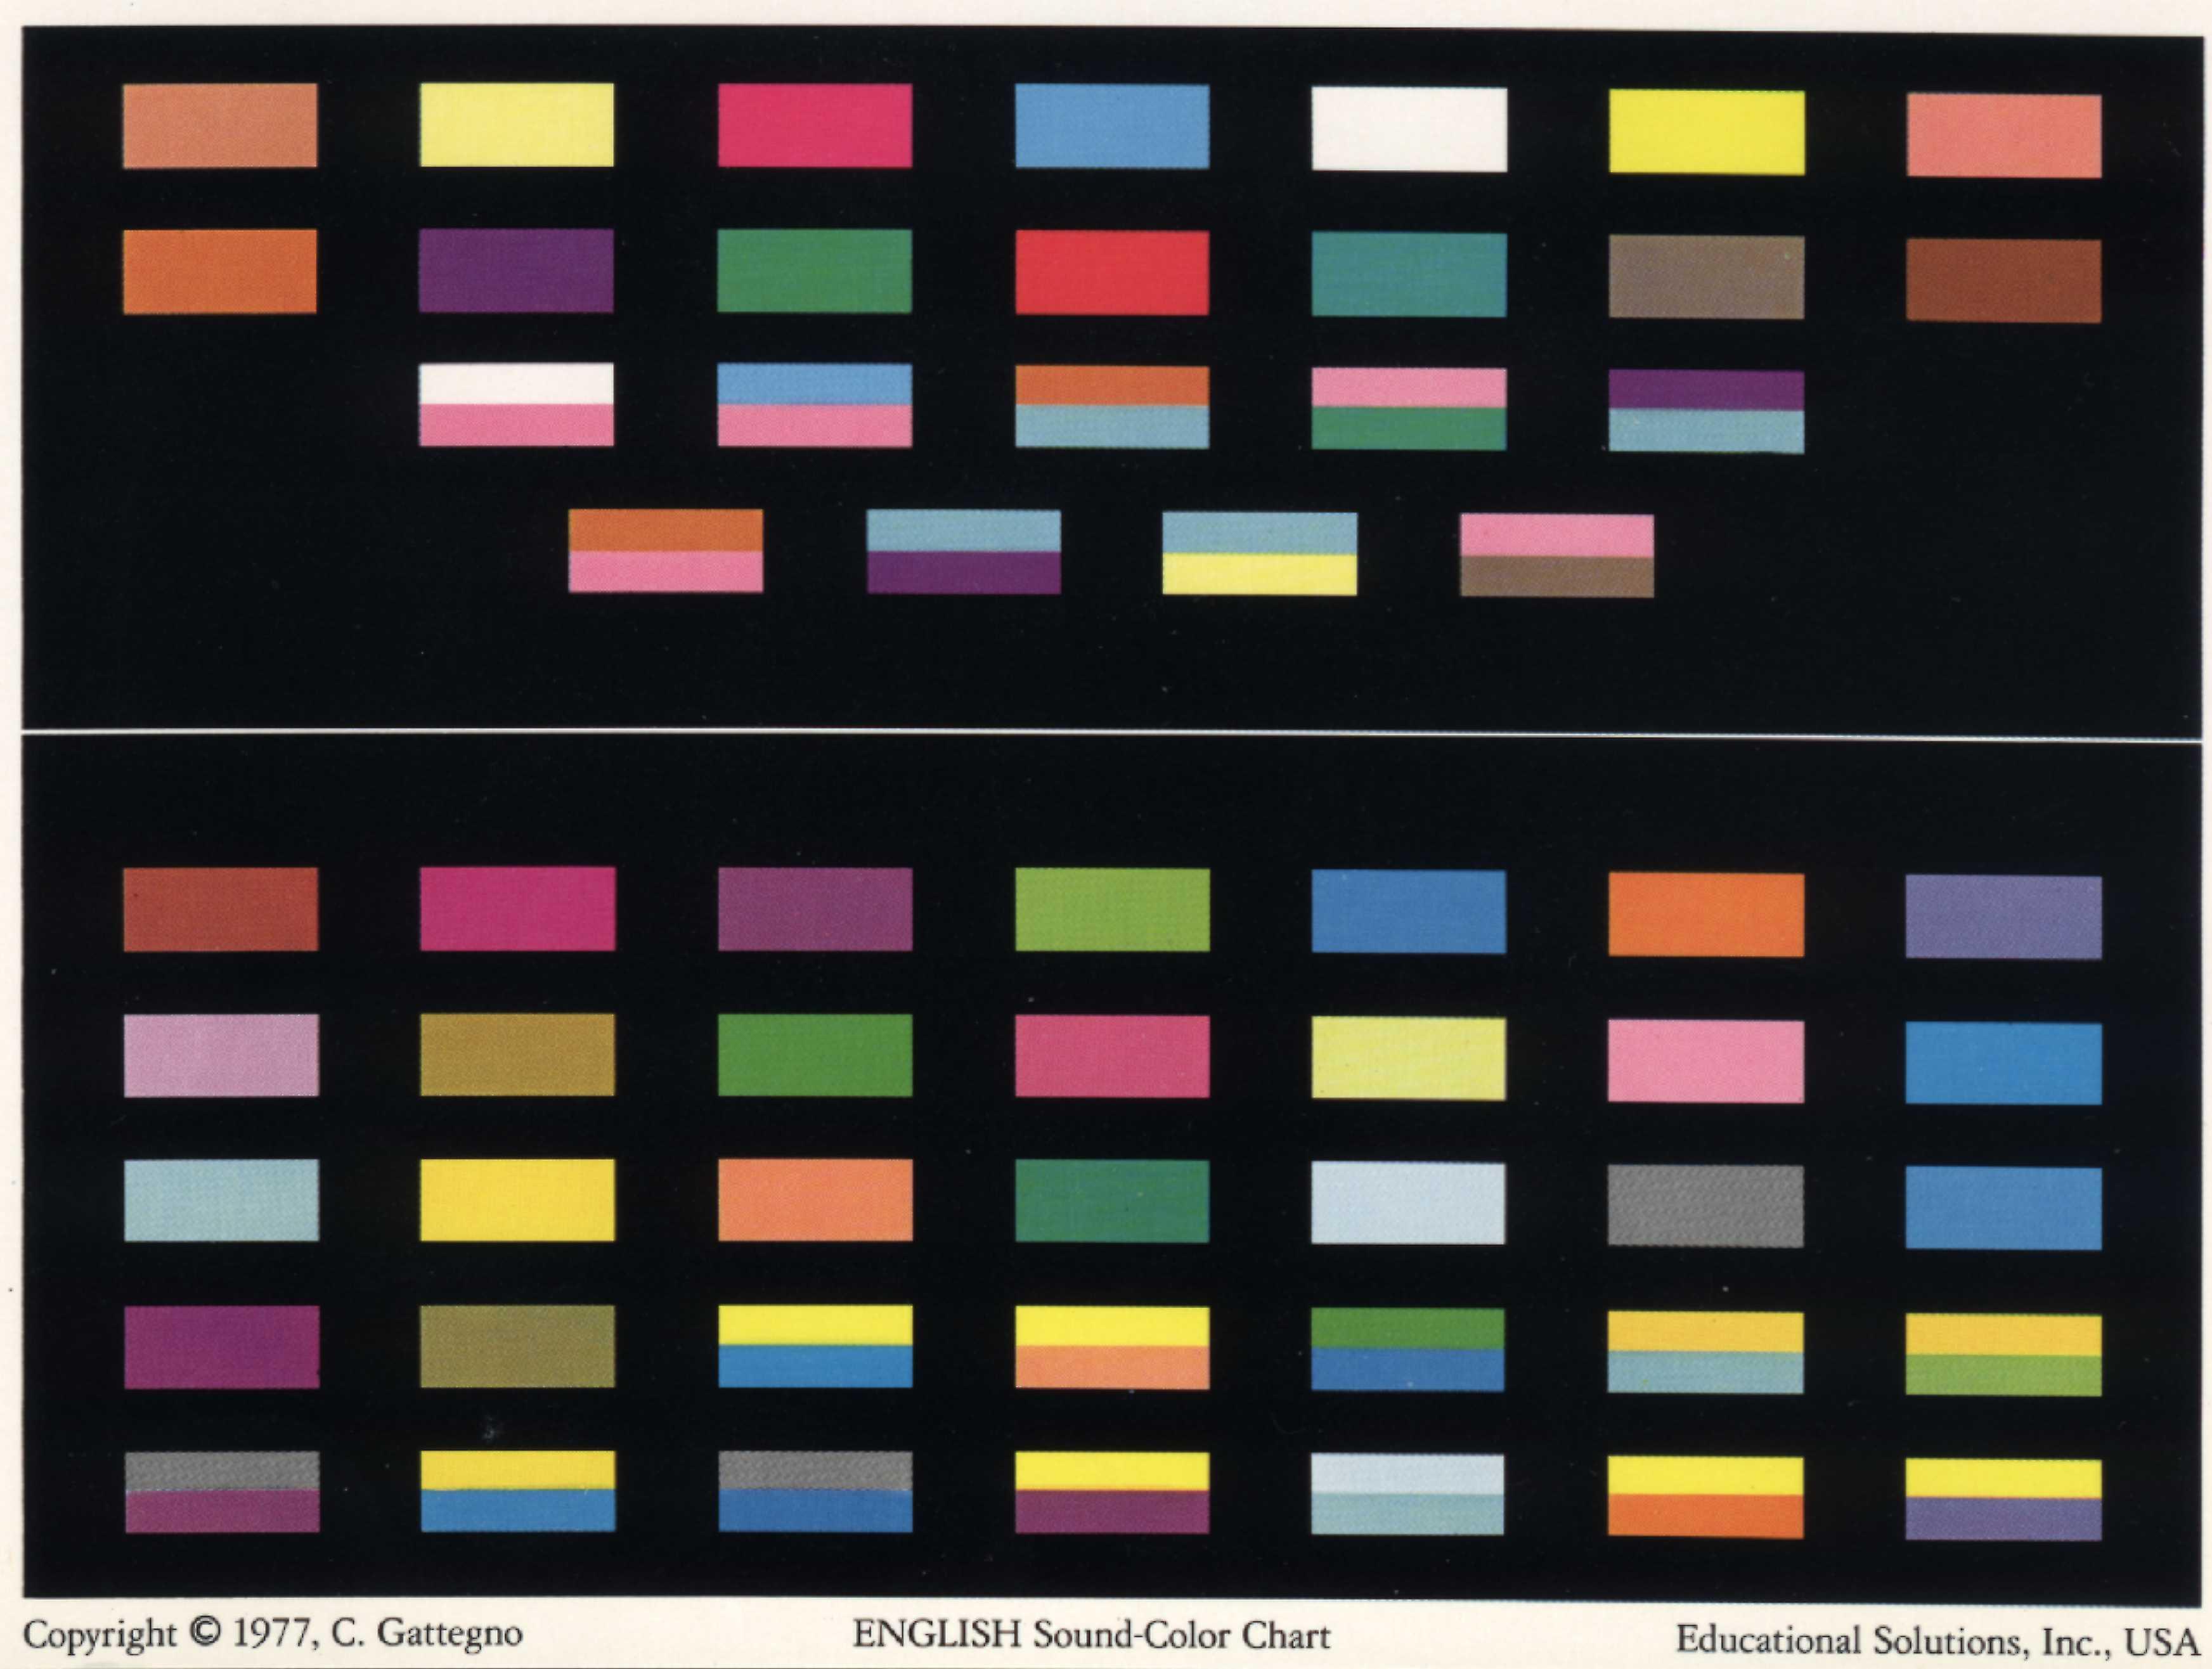 Filesilent way english sound color chartg wikimedia commons filesilent way english sound color chartg nvjuhfo Image collections